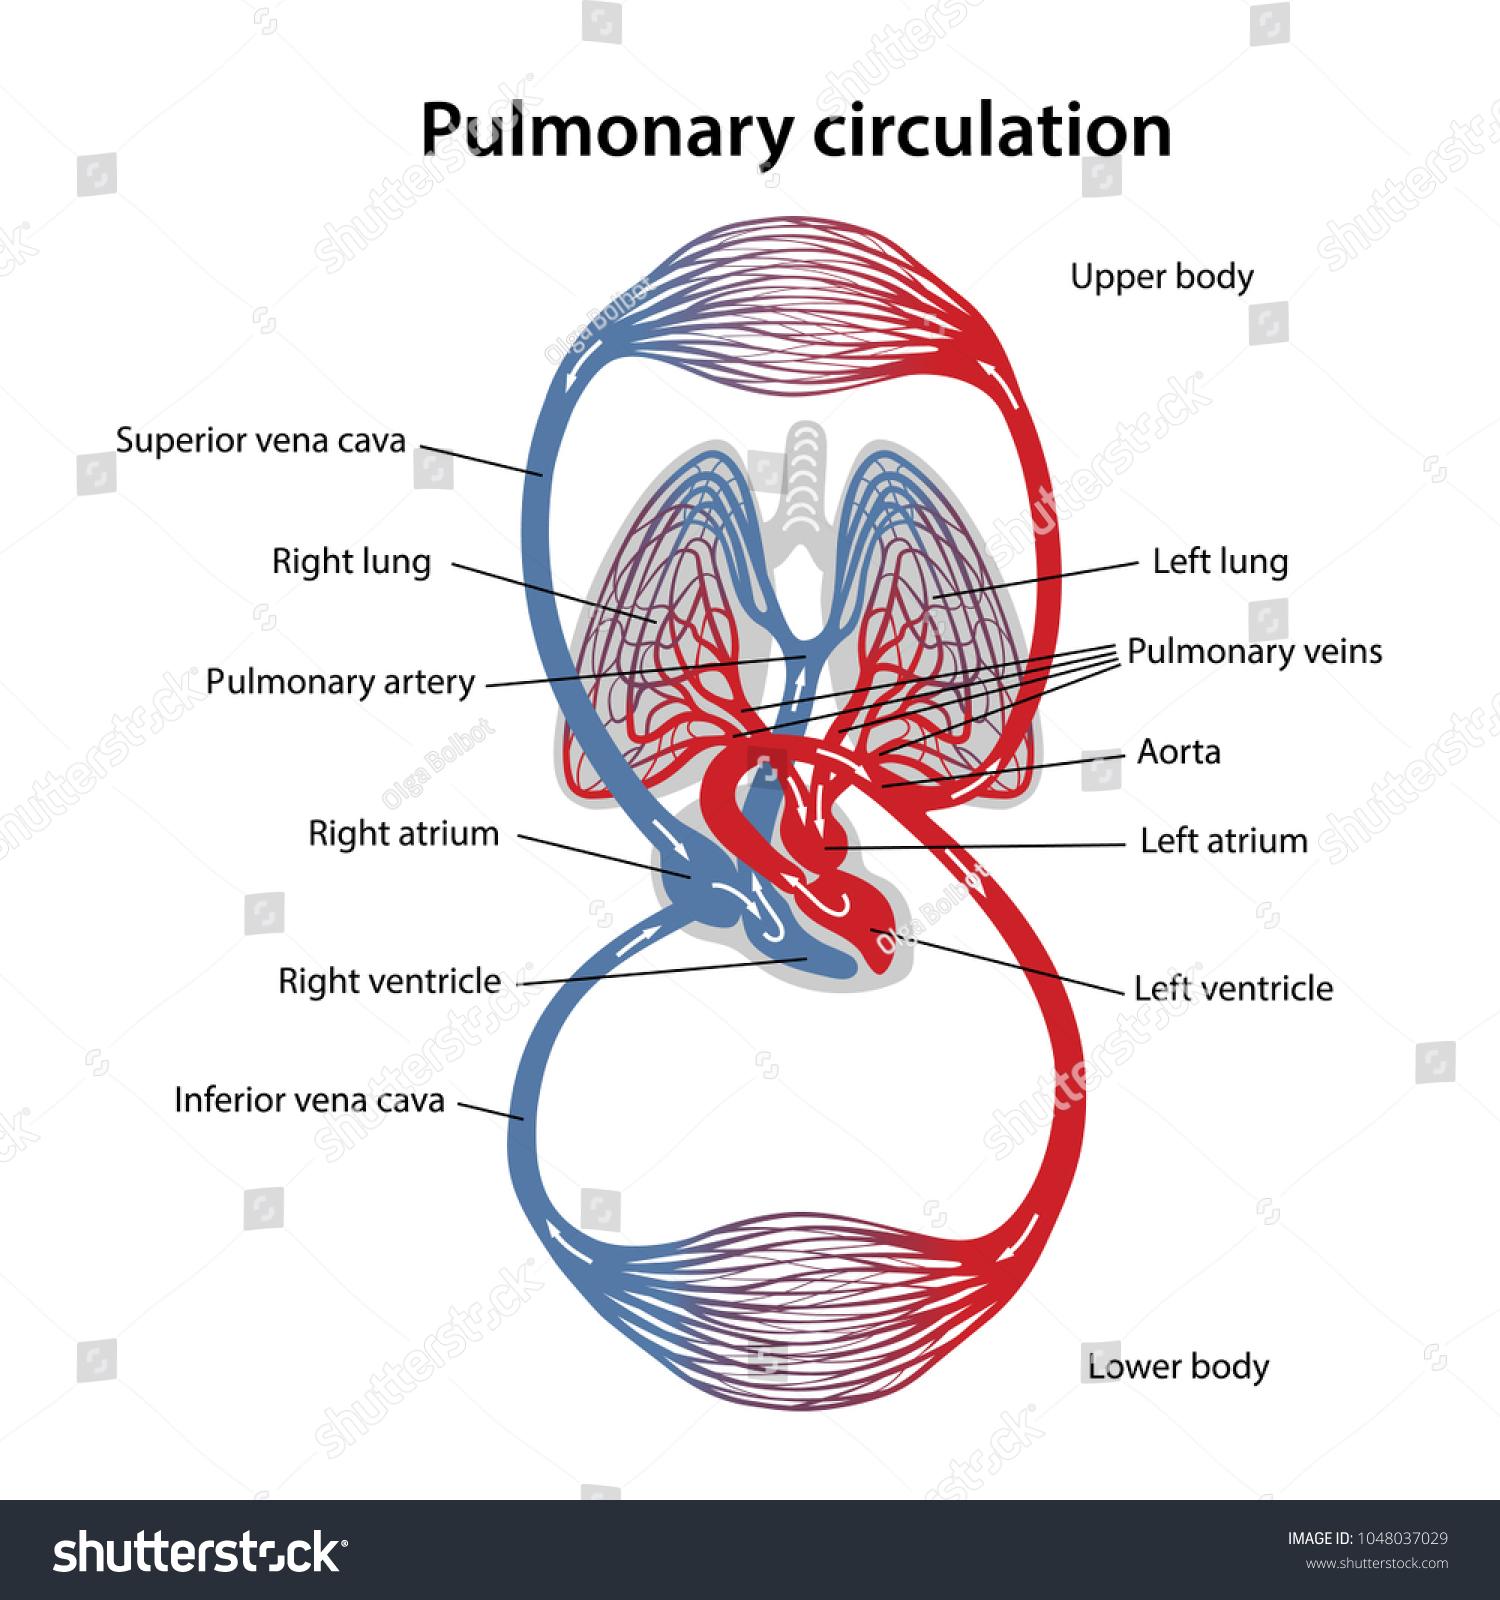 hight resolution of circulation of blood diagram of pulmonary circulation vector illustration of great and small circles of blood circulation